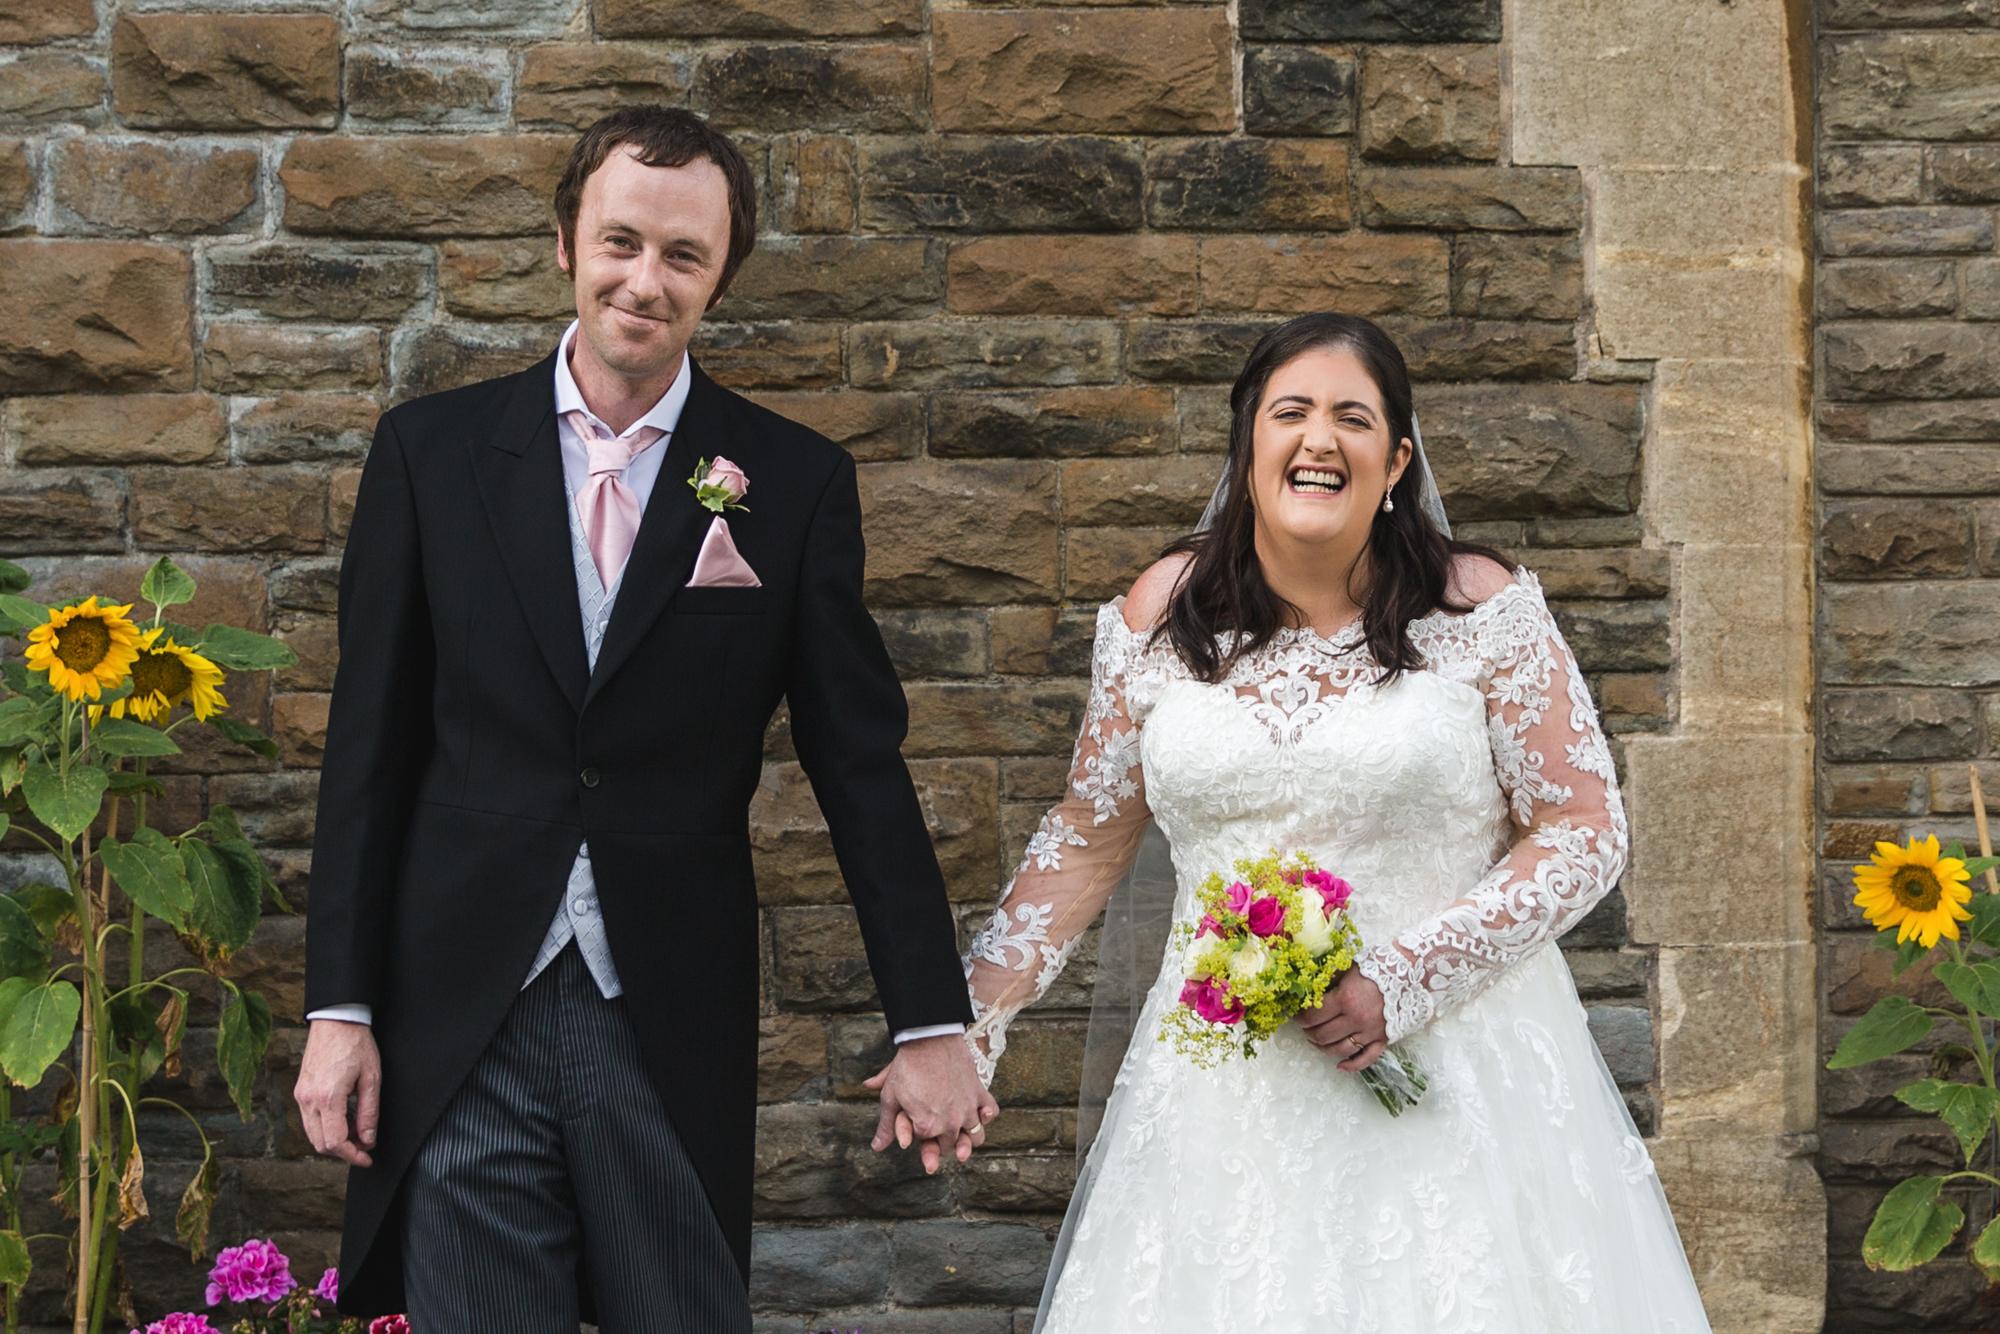 bride and groom natural wedding photo at St Martins Church, Caerphilly